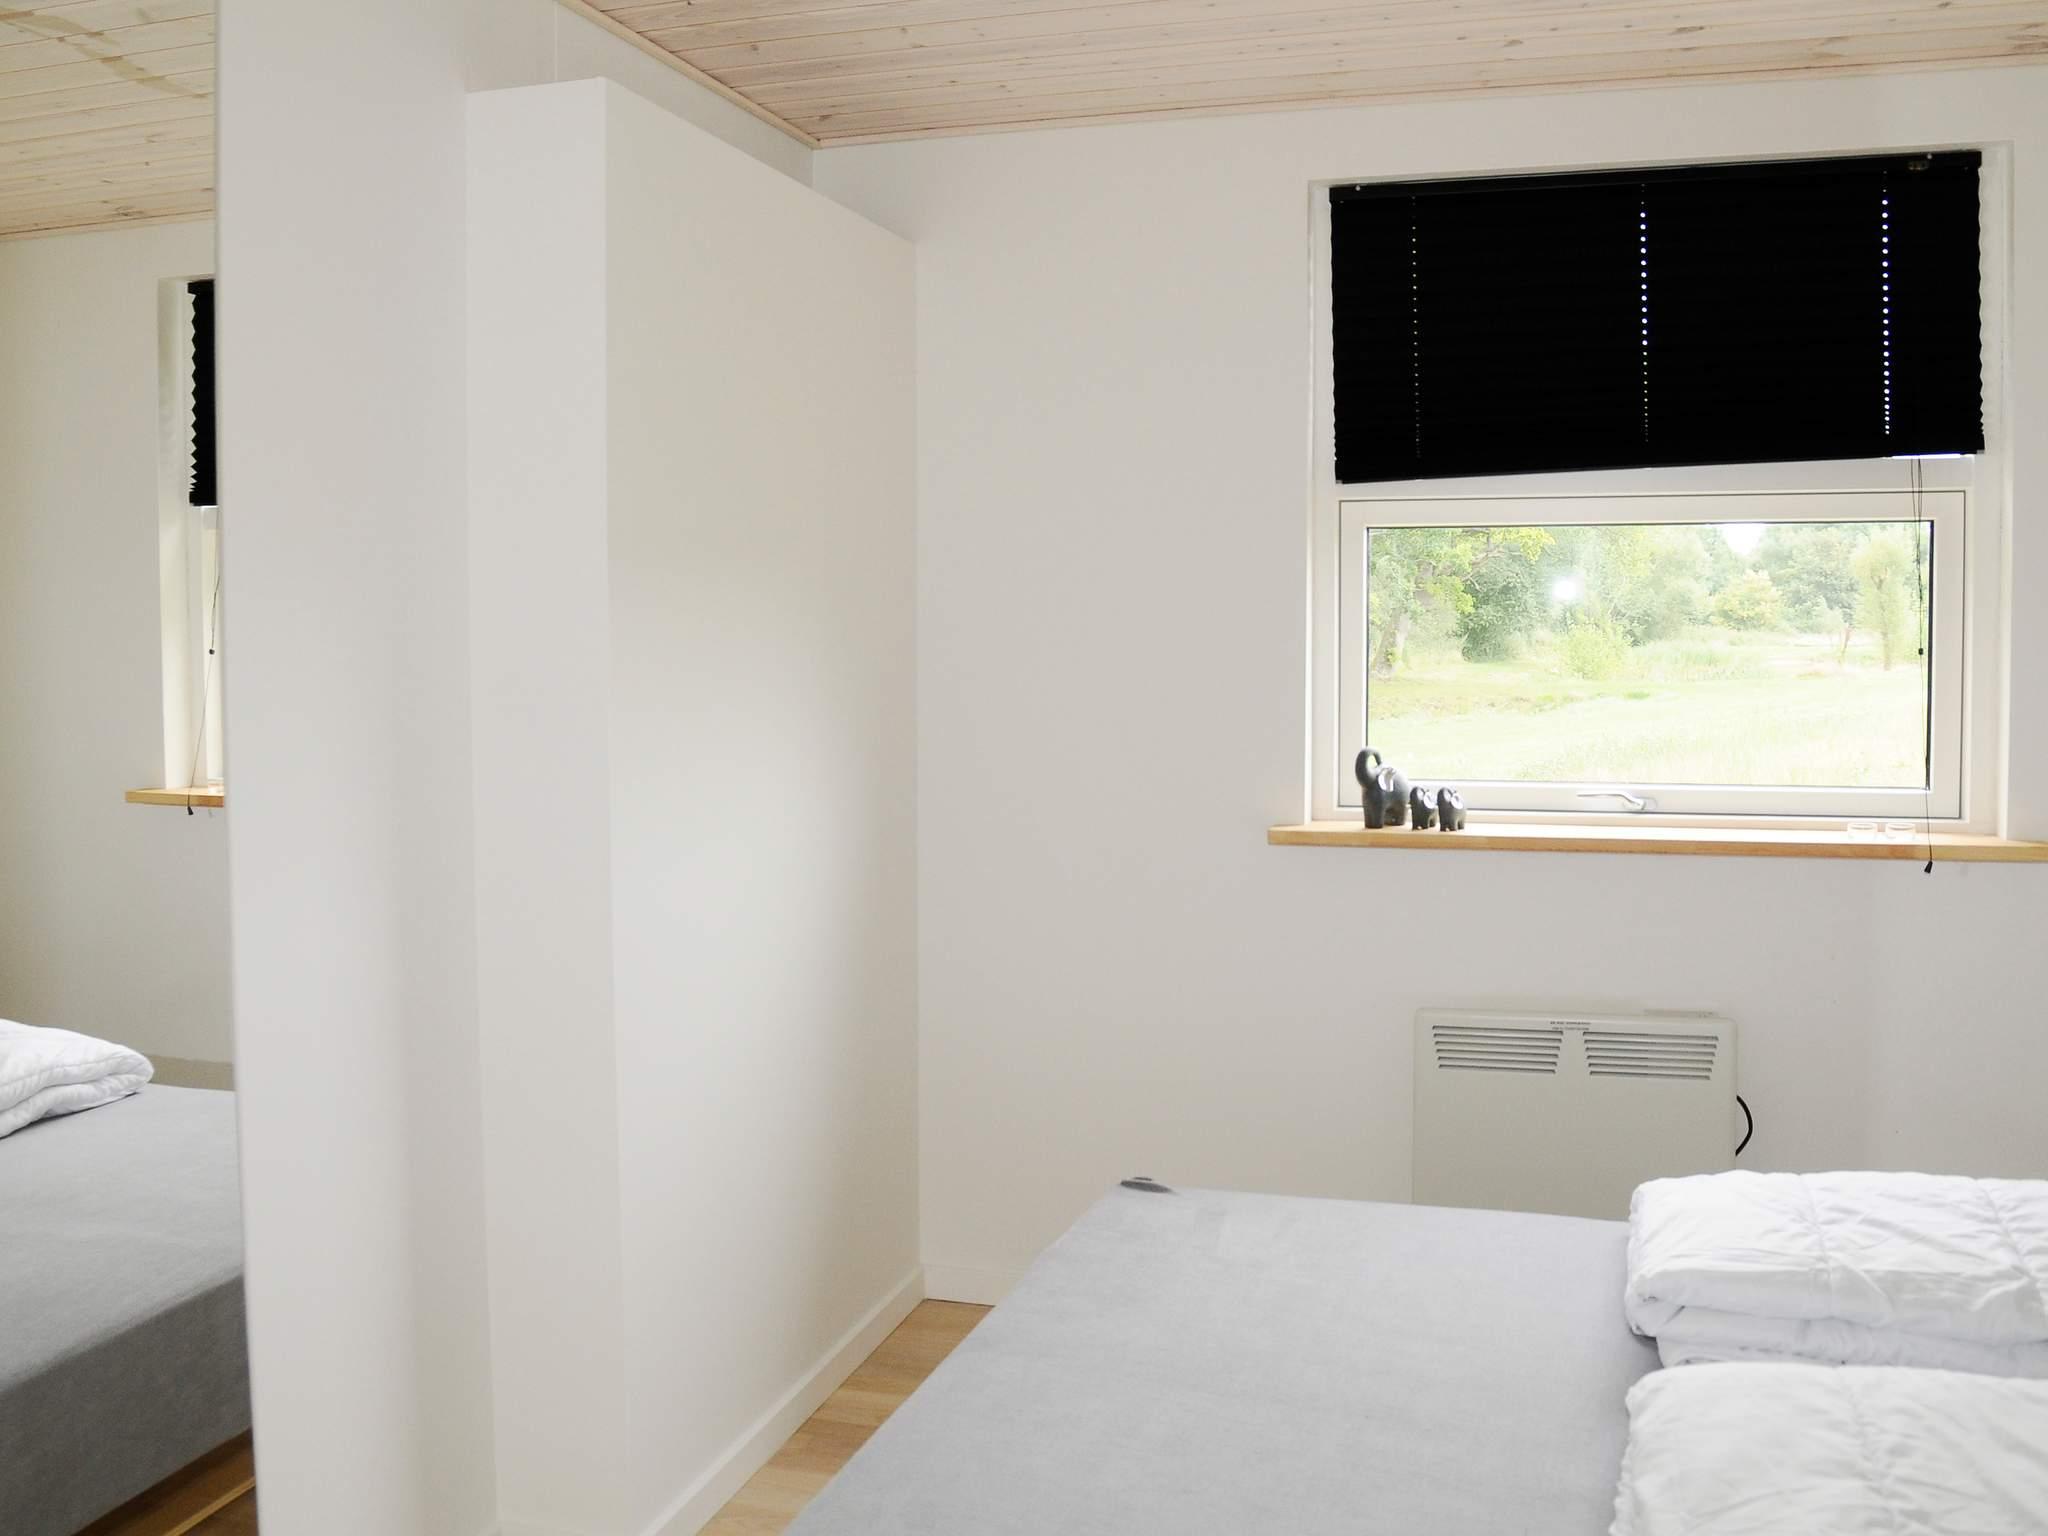 Ferienhaus Fjellerup Strand (336605), Fjellerup, , Ostjütland, Dänemark, Bild 9